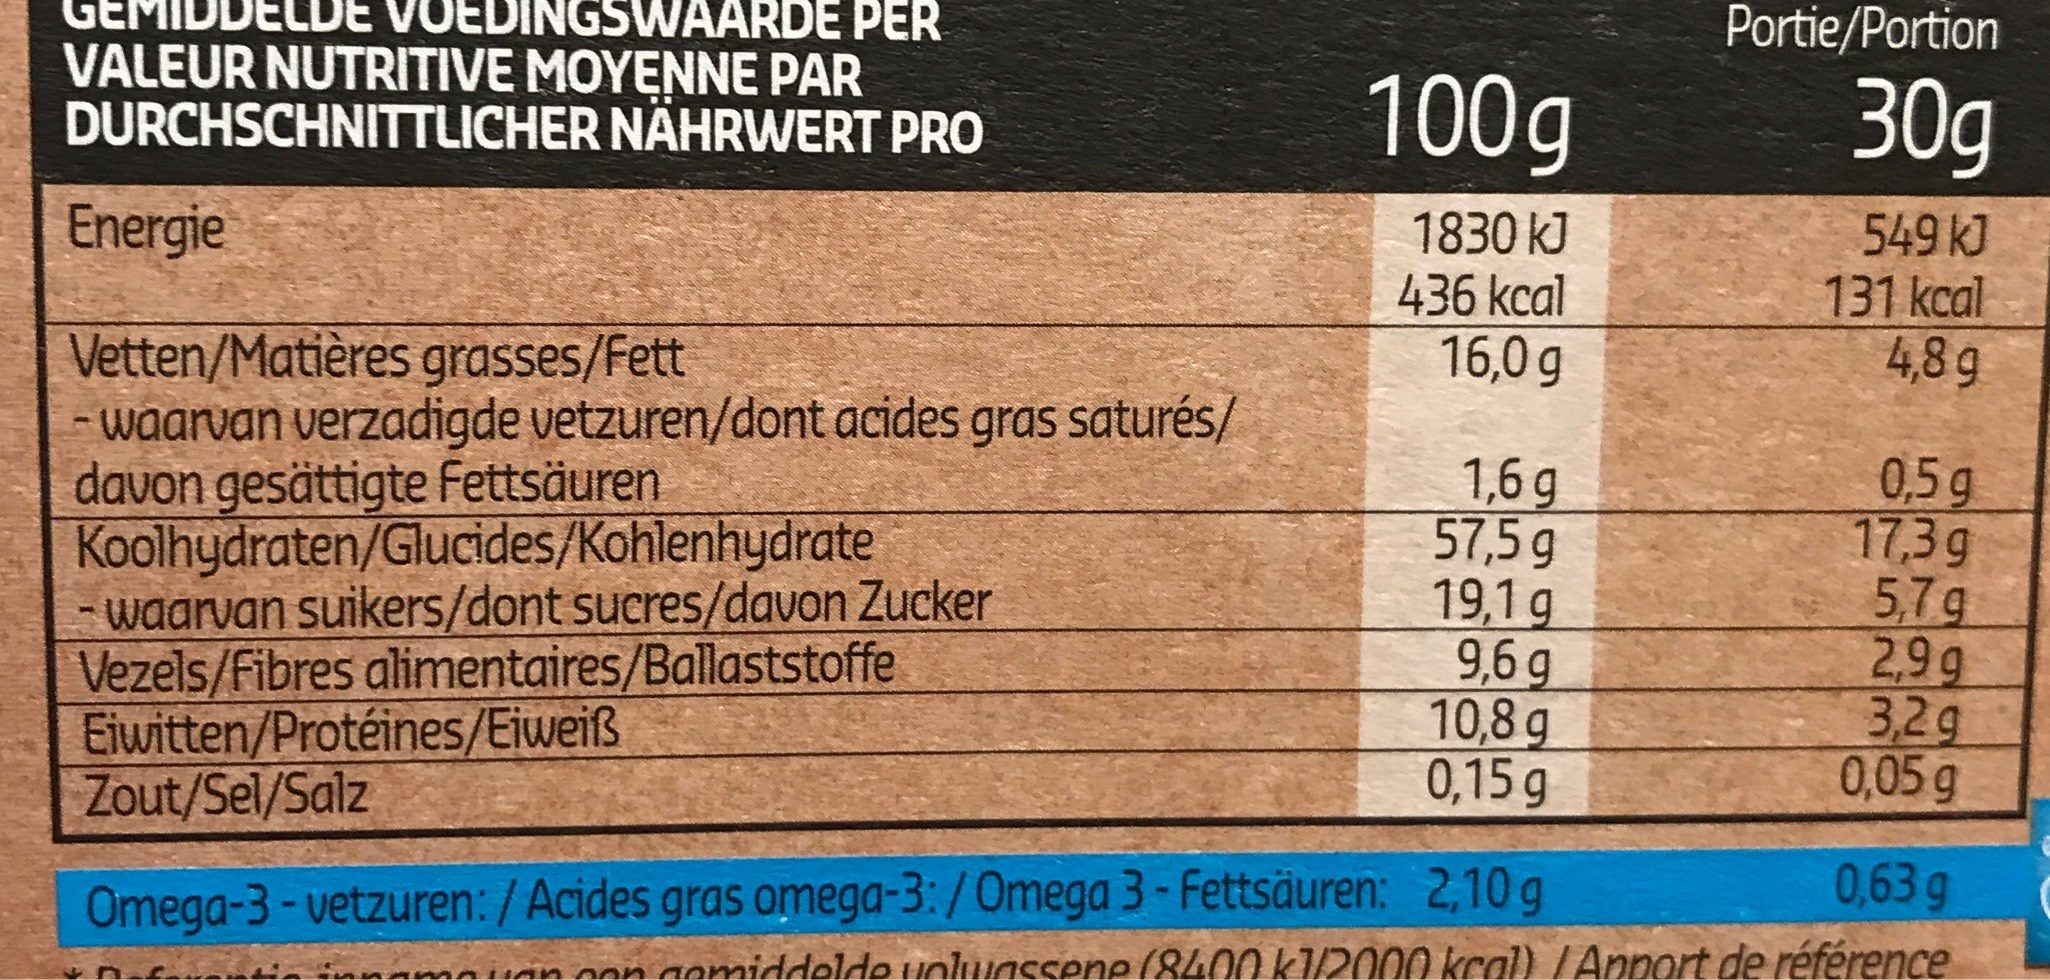 Crunchy muesli amandes et myrtille - Informations nutritionnelles - fr